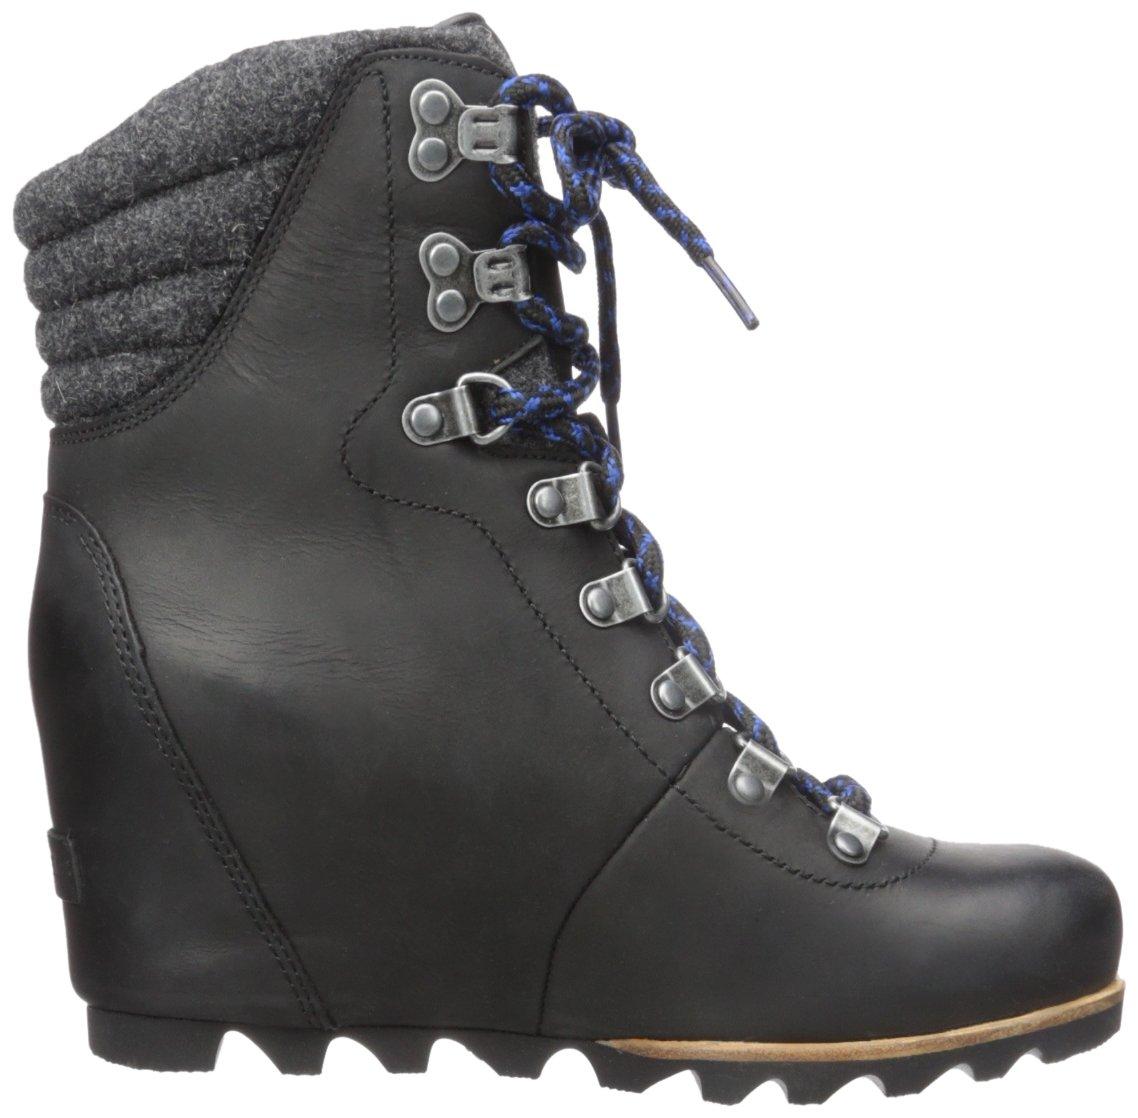 SOREL Women's Conquest Wedge Mid Calf Boot, Black, 11 M US by SOREL (Image #8)